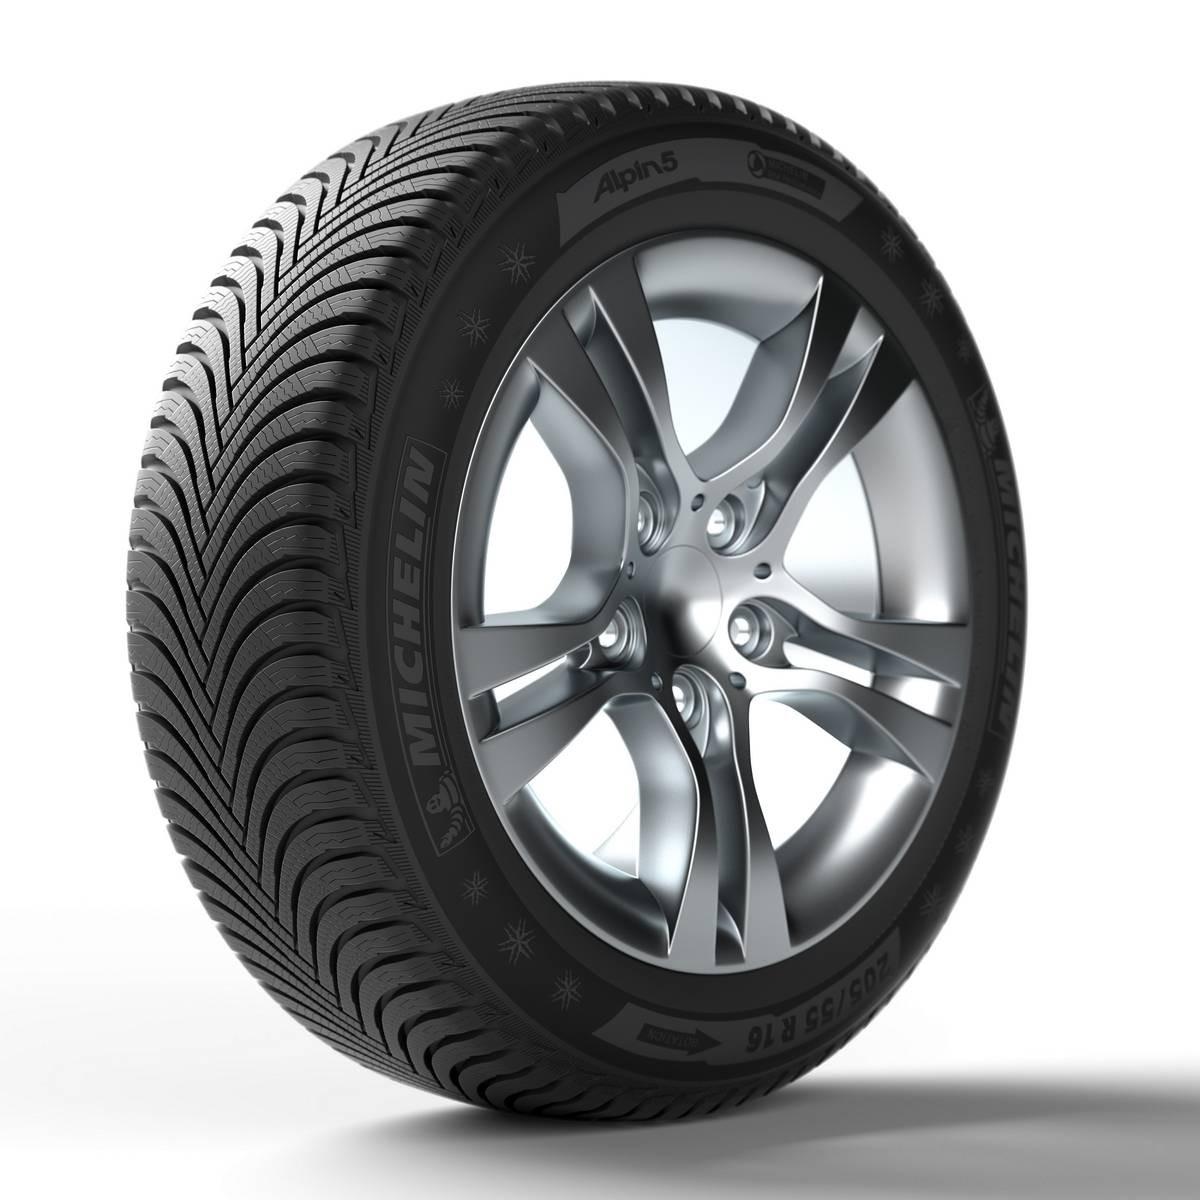 205/55 R19 97H Michelin Alpin 5 XL